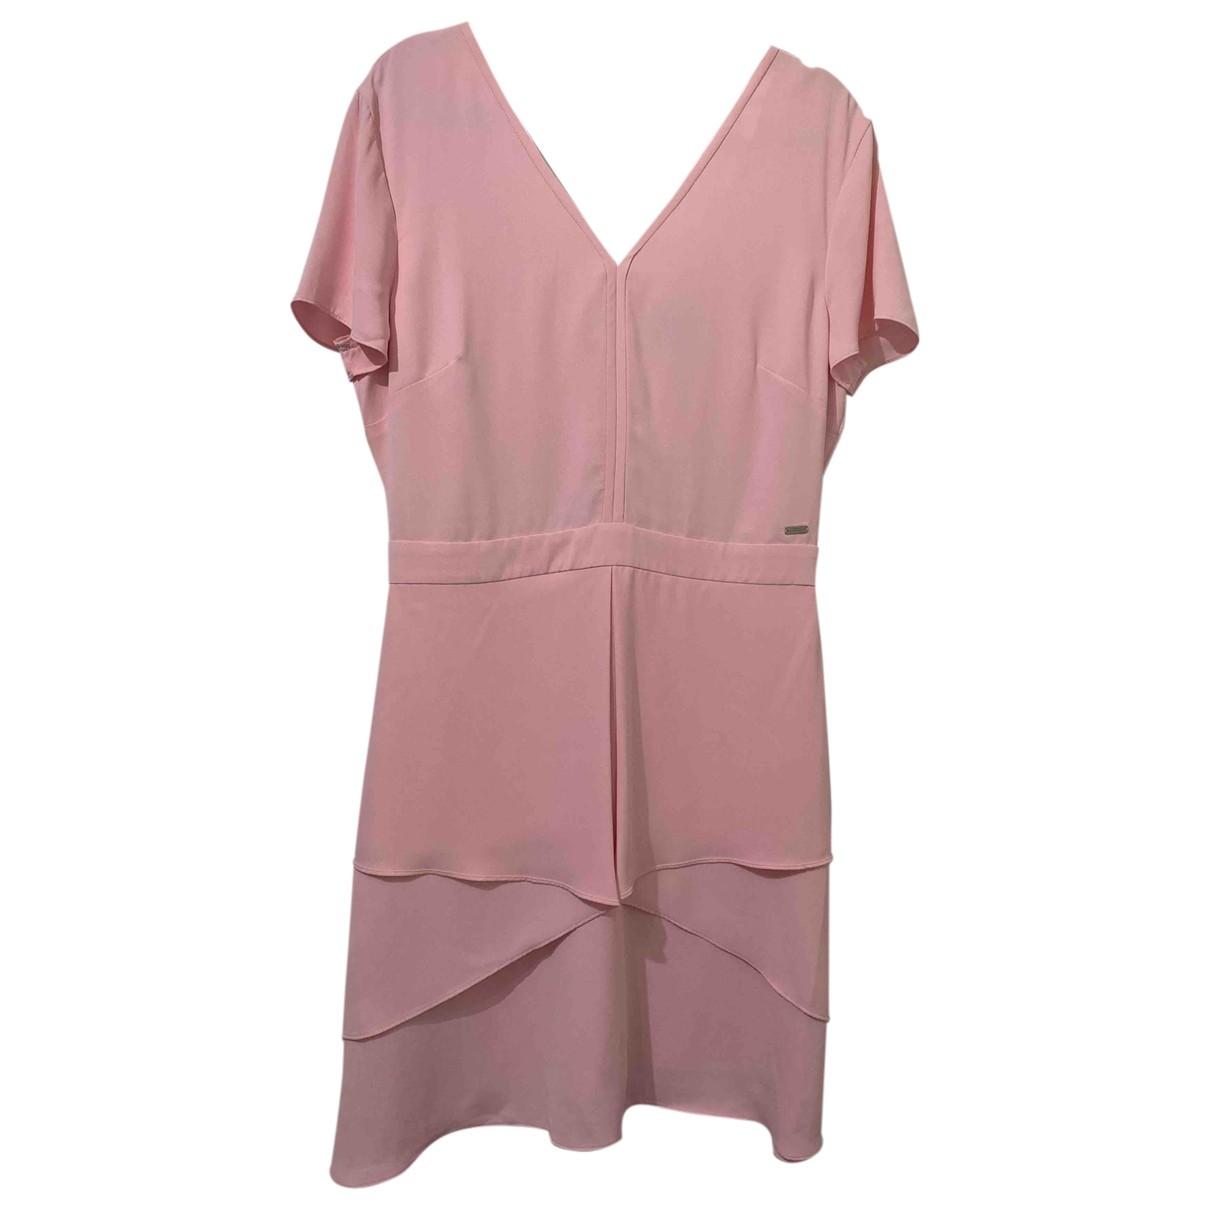 Emporio Armani \N Kleid in  Rosa Polyester